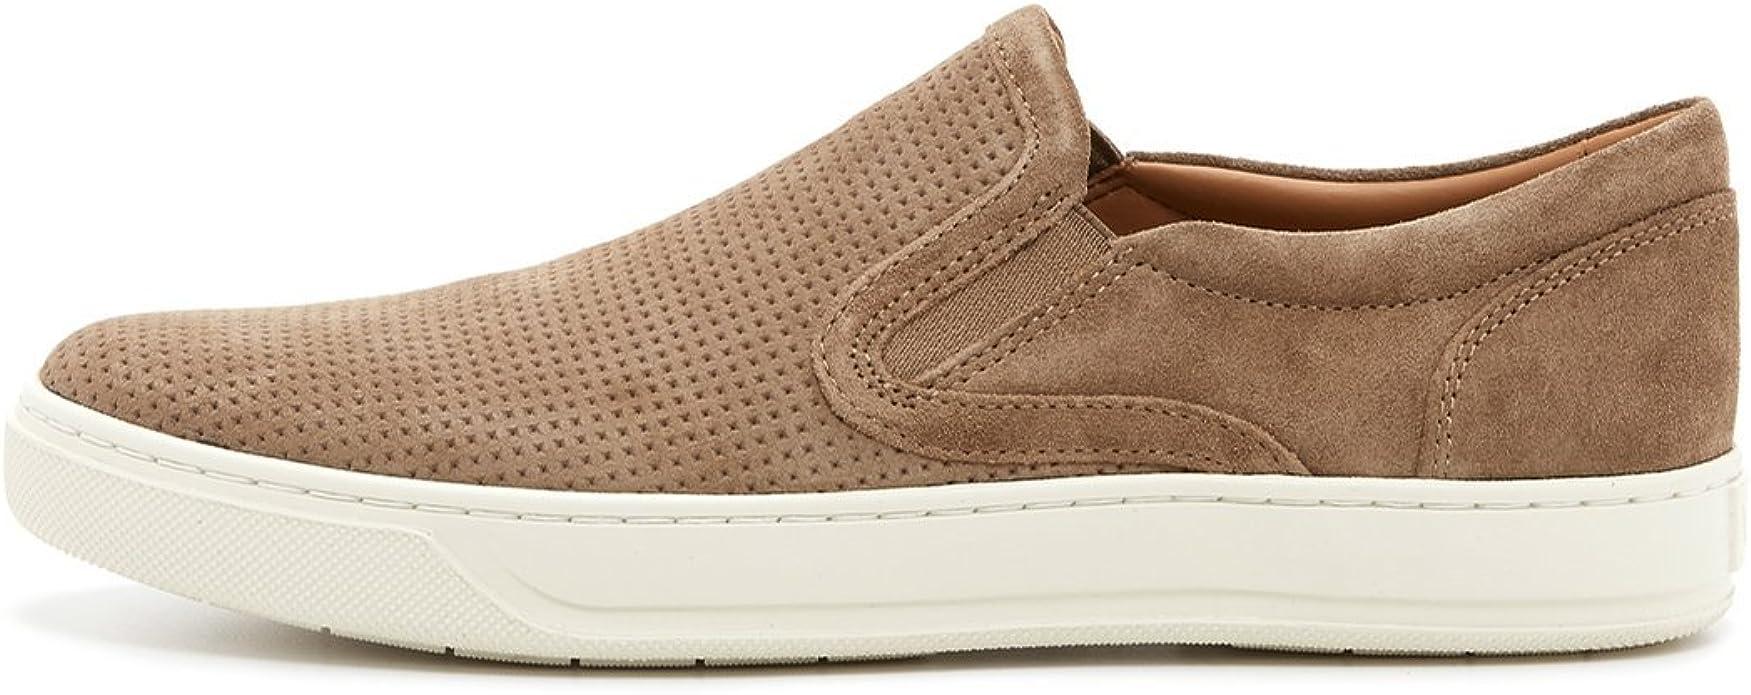 Vince Men's Ace Slip On Sneaker: Amazon